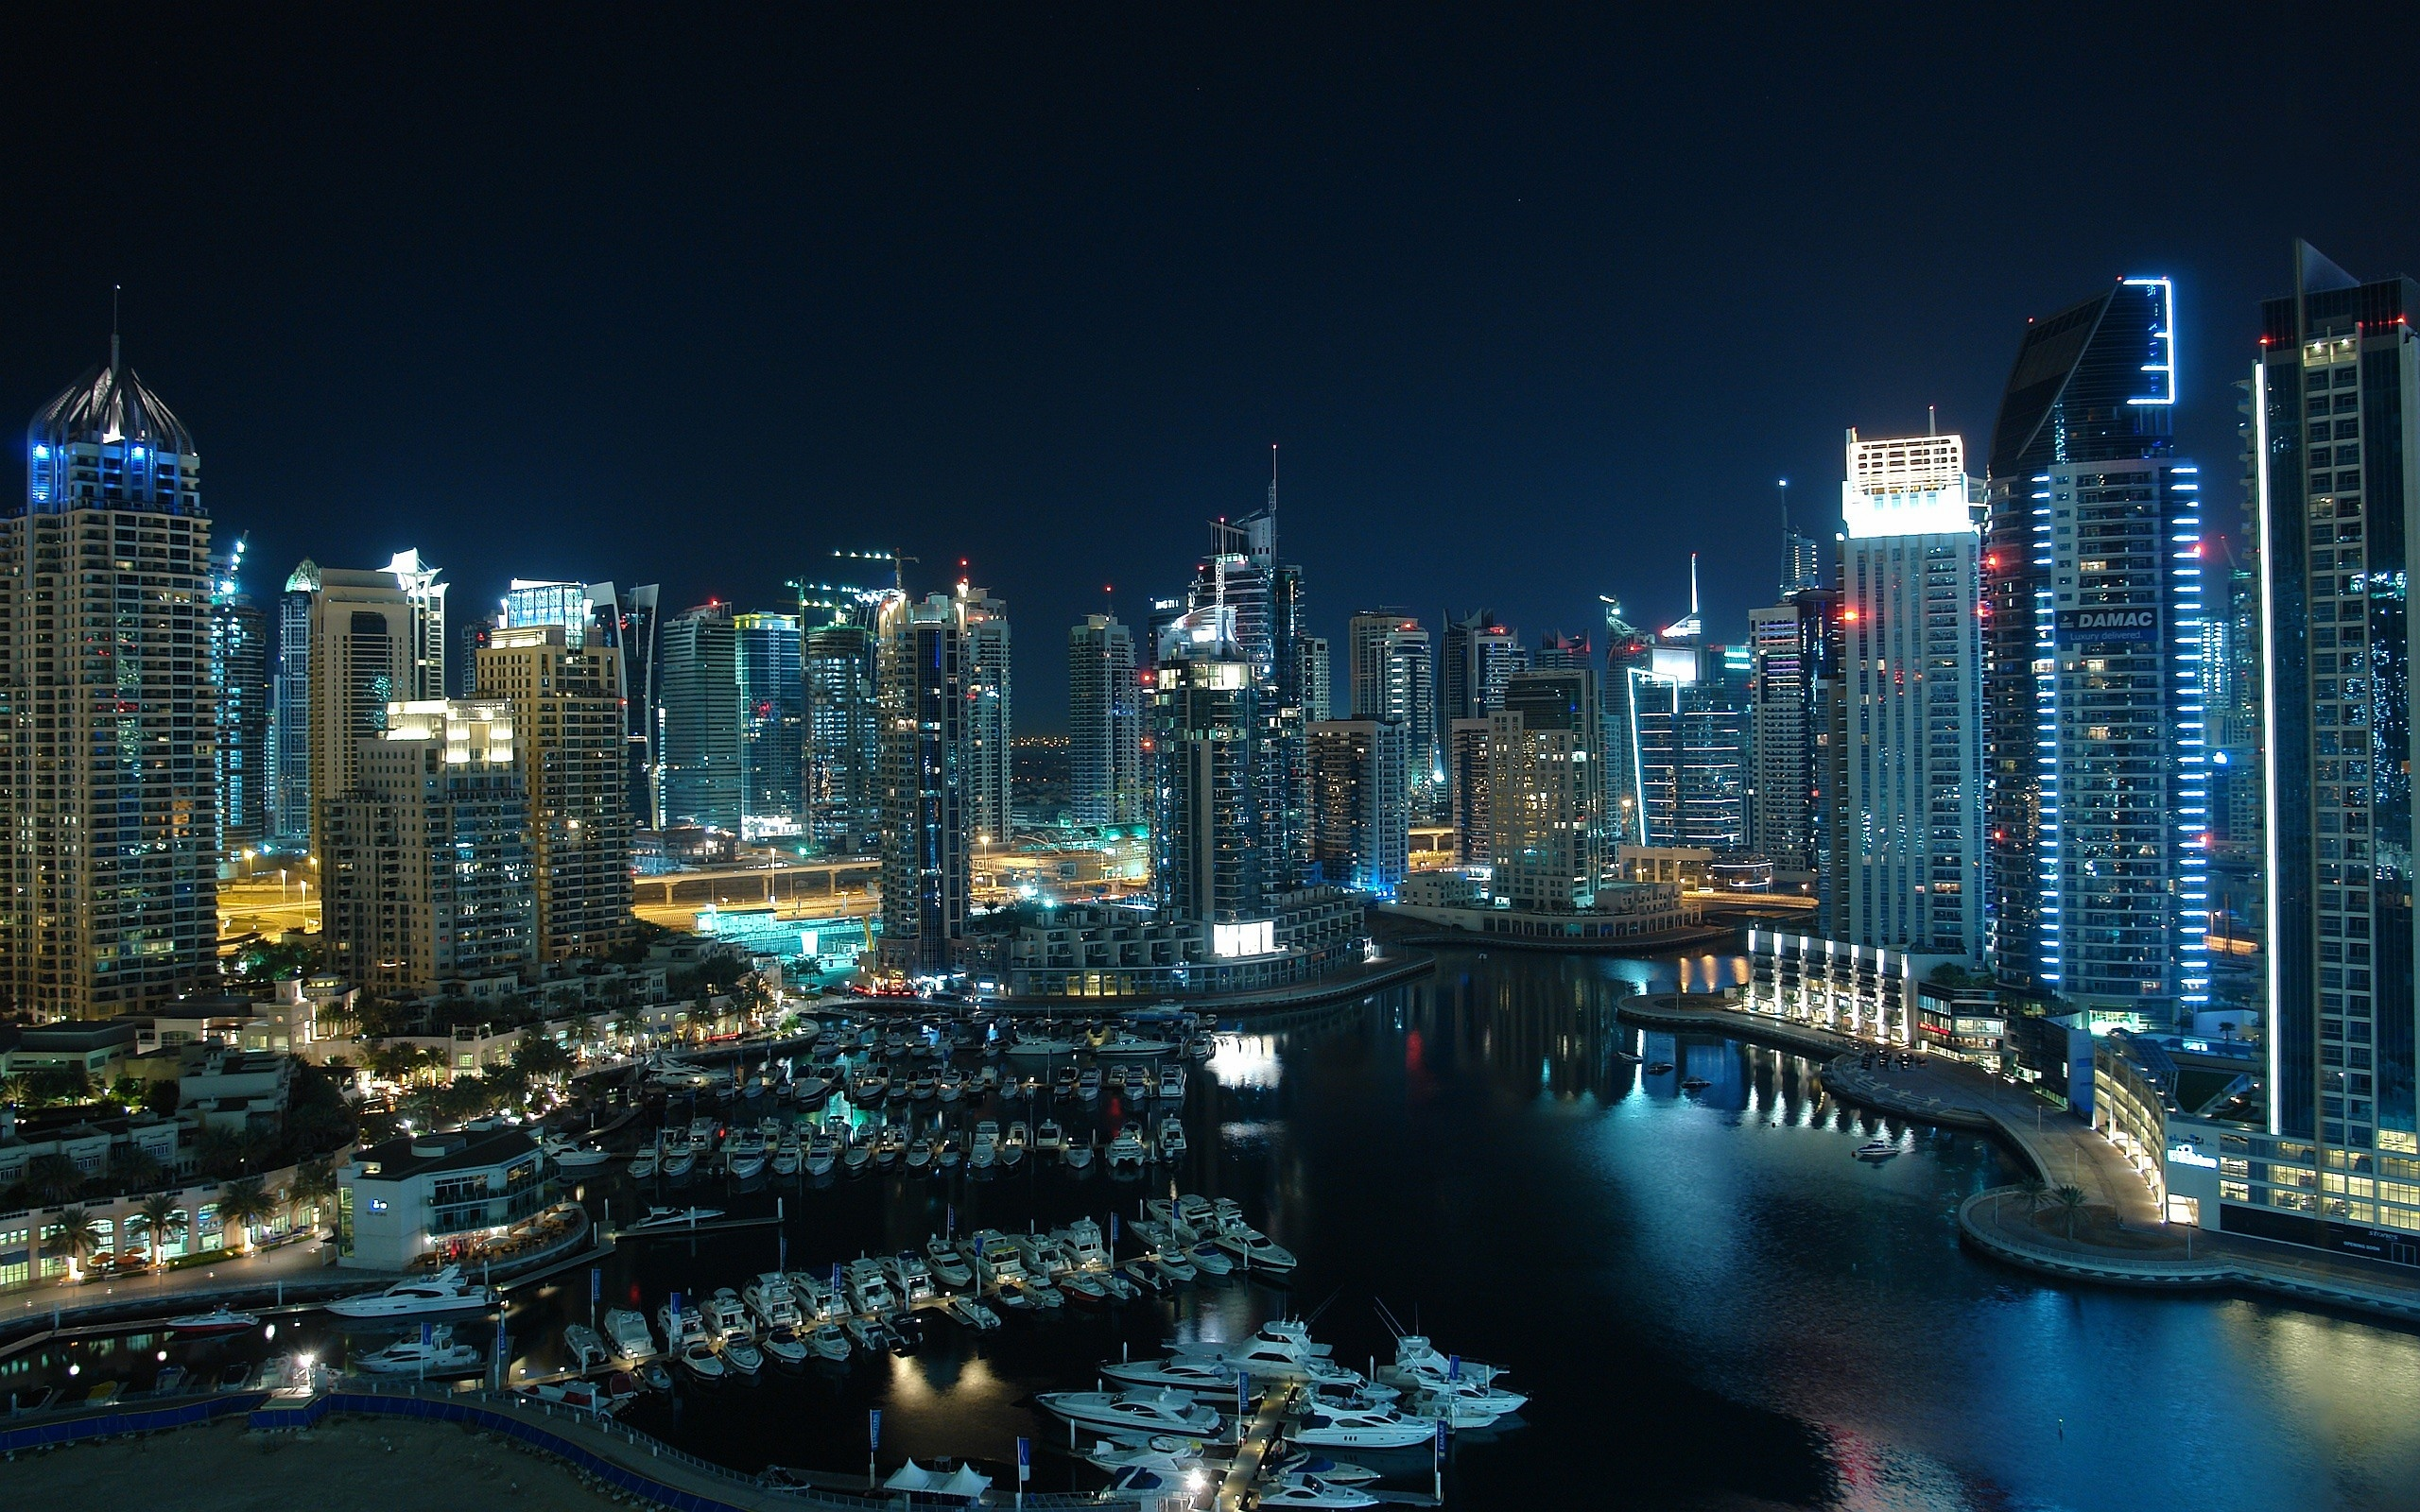 City Dubai Wallpapers 2560x1600 3785 Wallpaper Cool Walldiskpaper 2560x1600